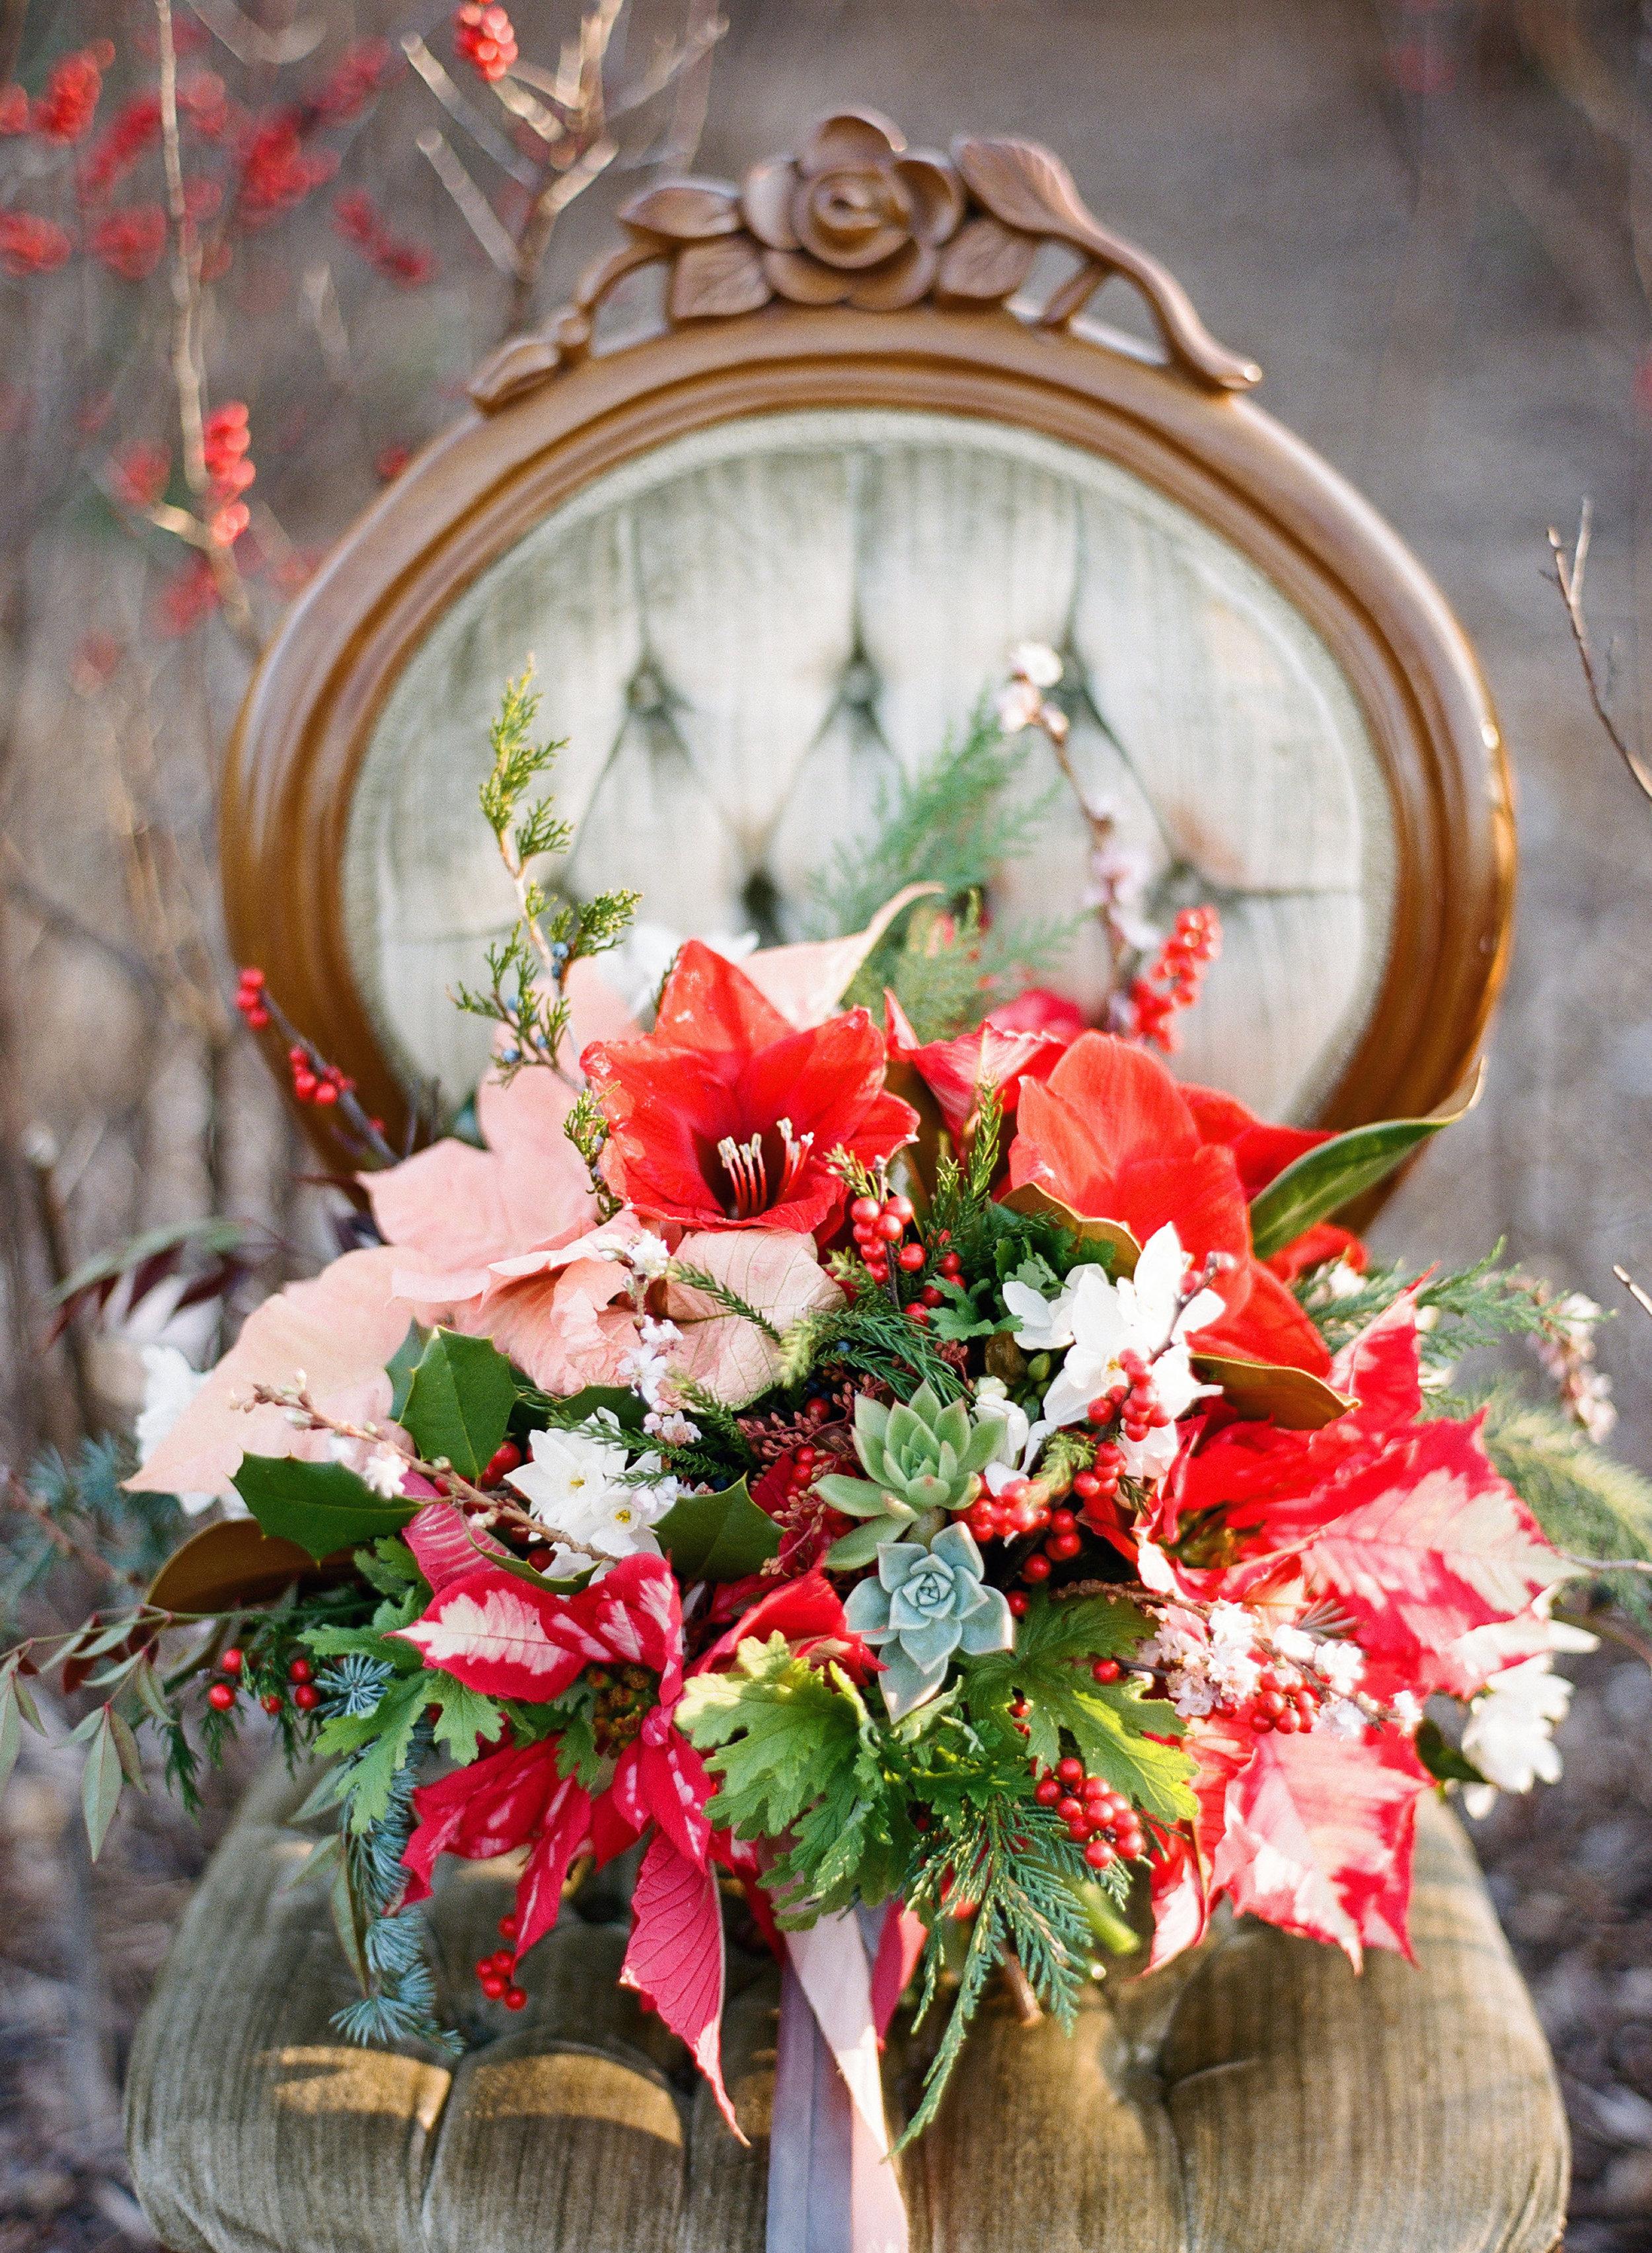 063_Floral_Winter.jpg